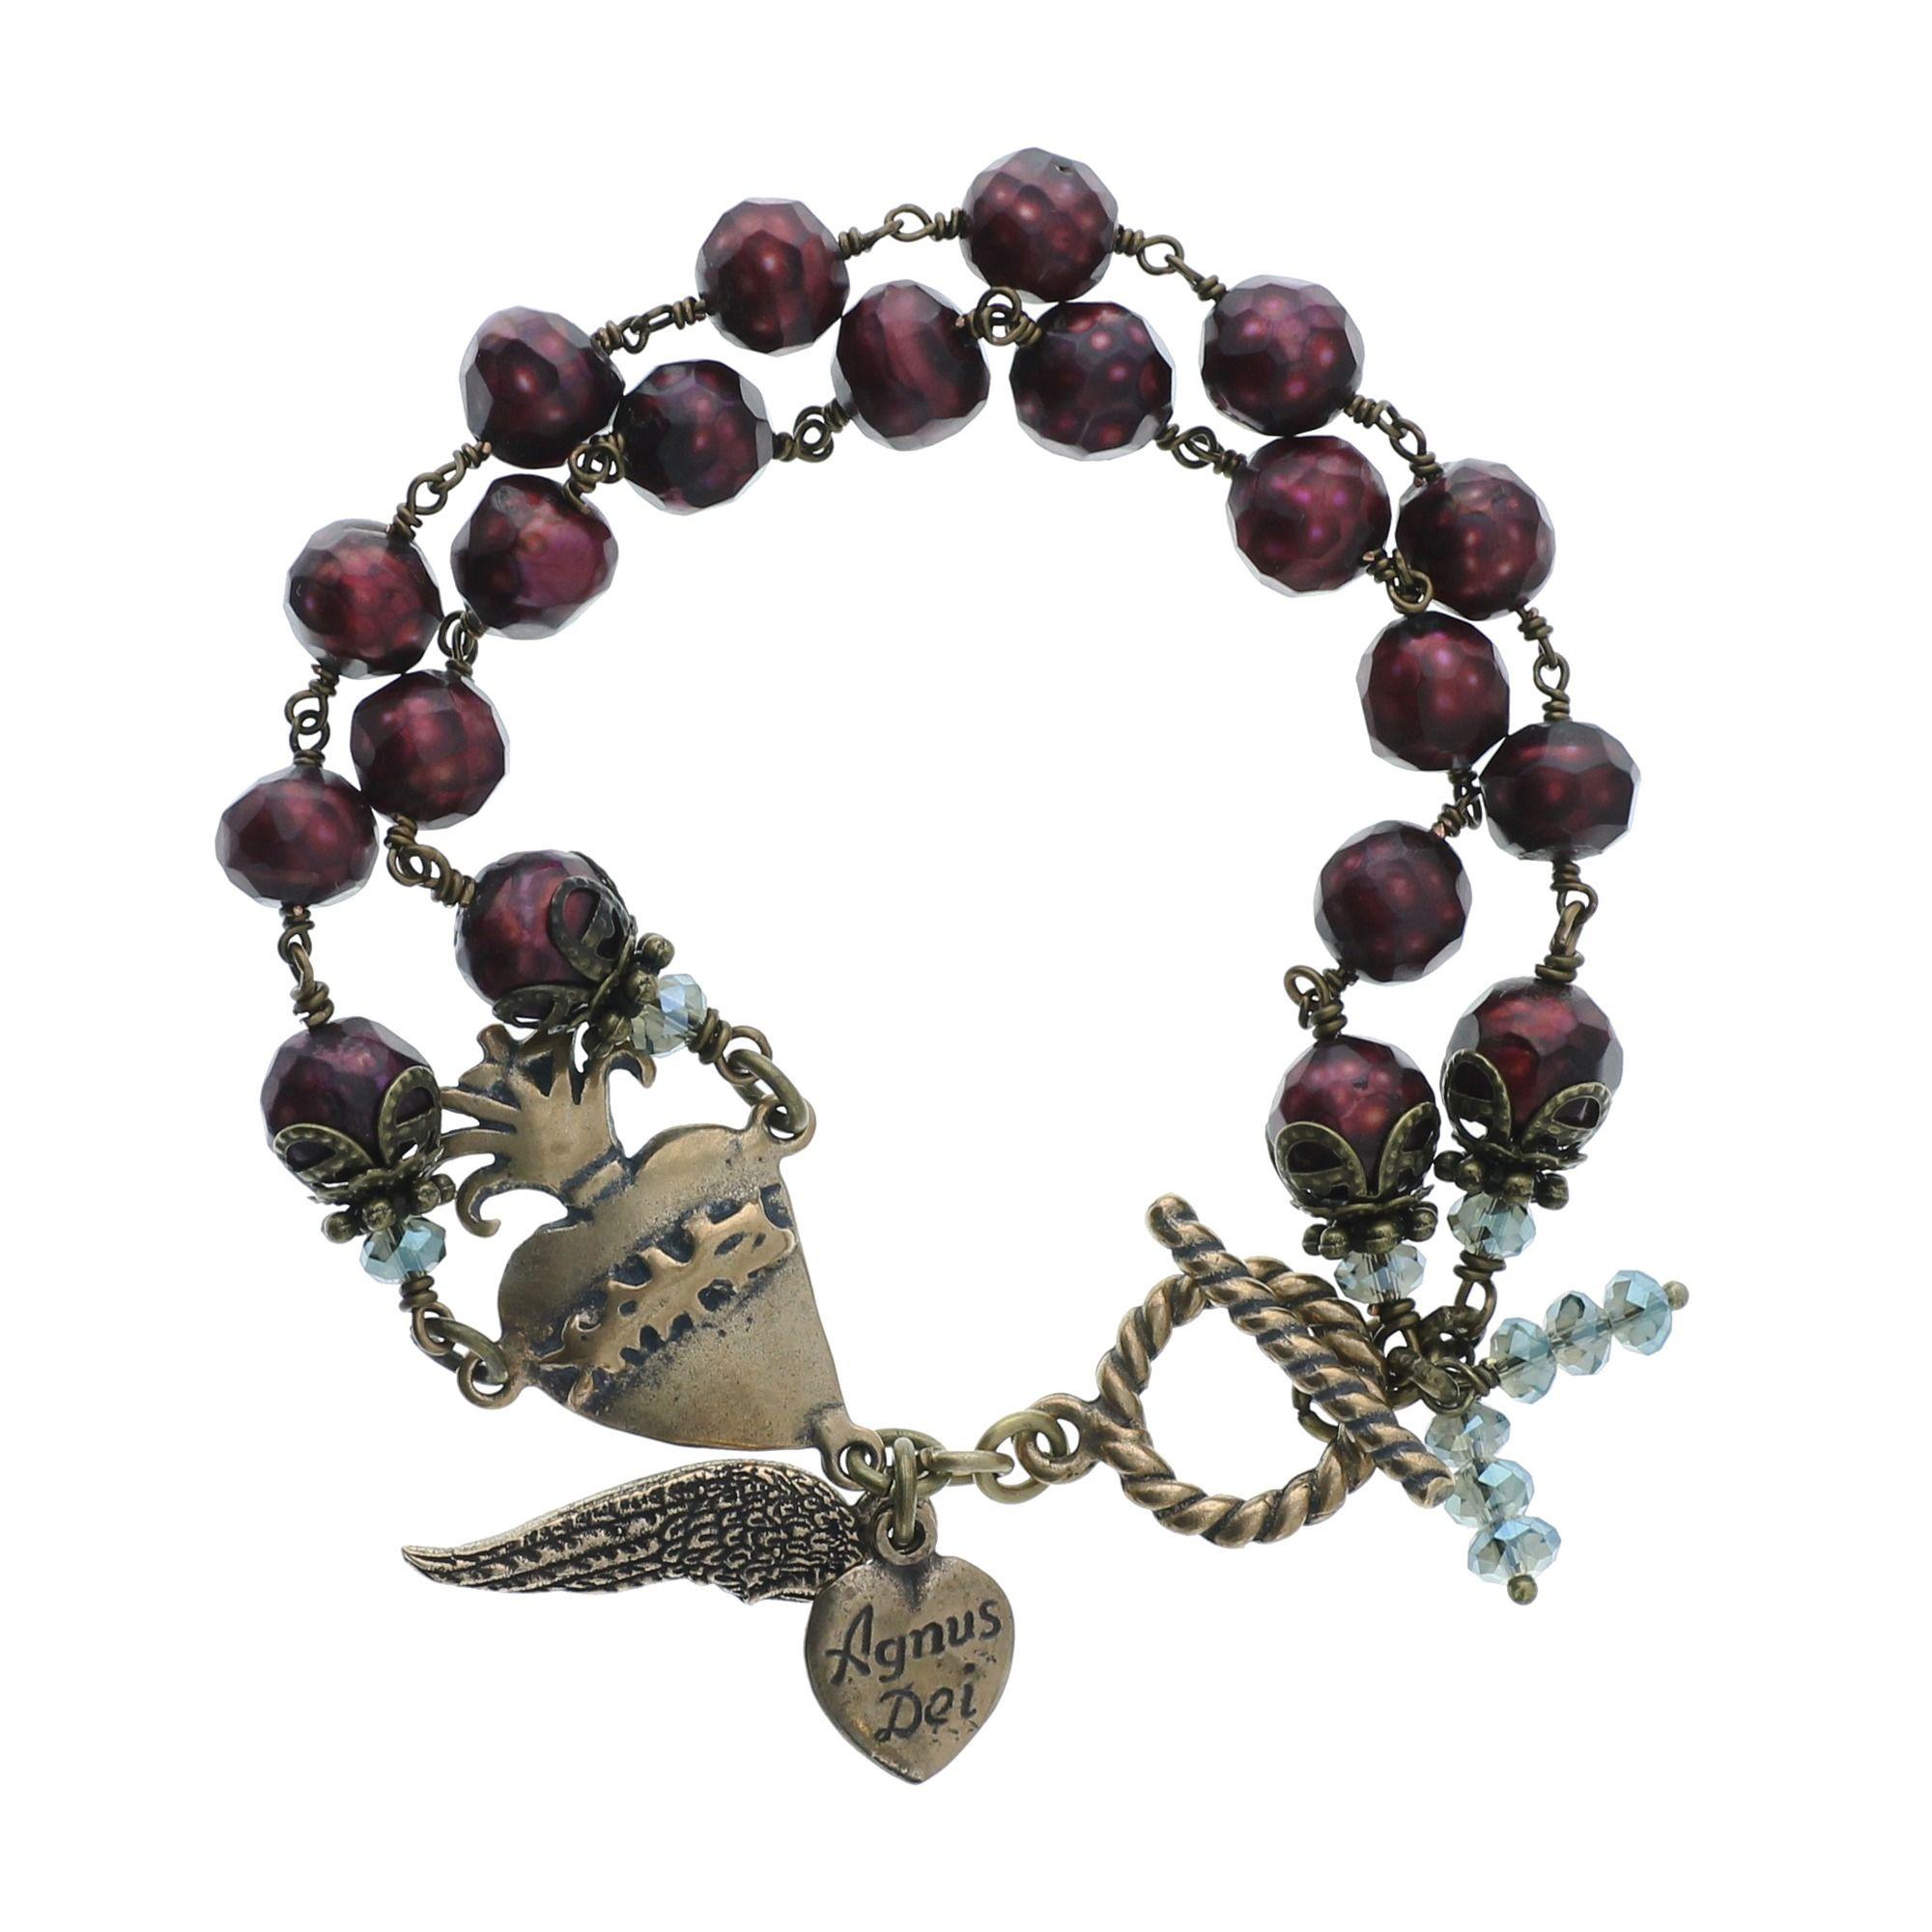 Pope saint john paul ii bronze necklace catholic company rosary